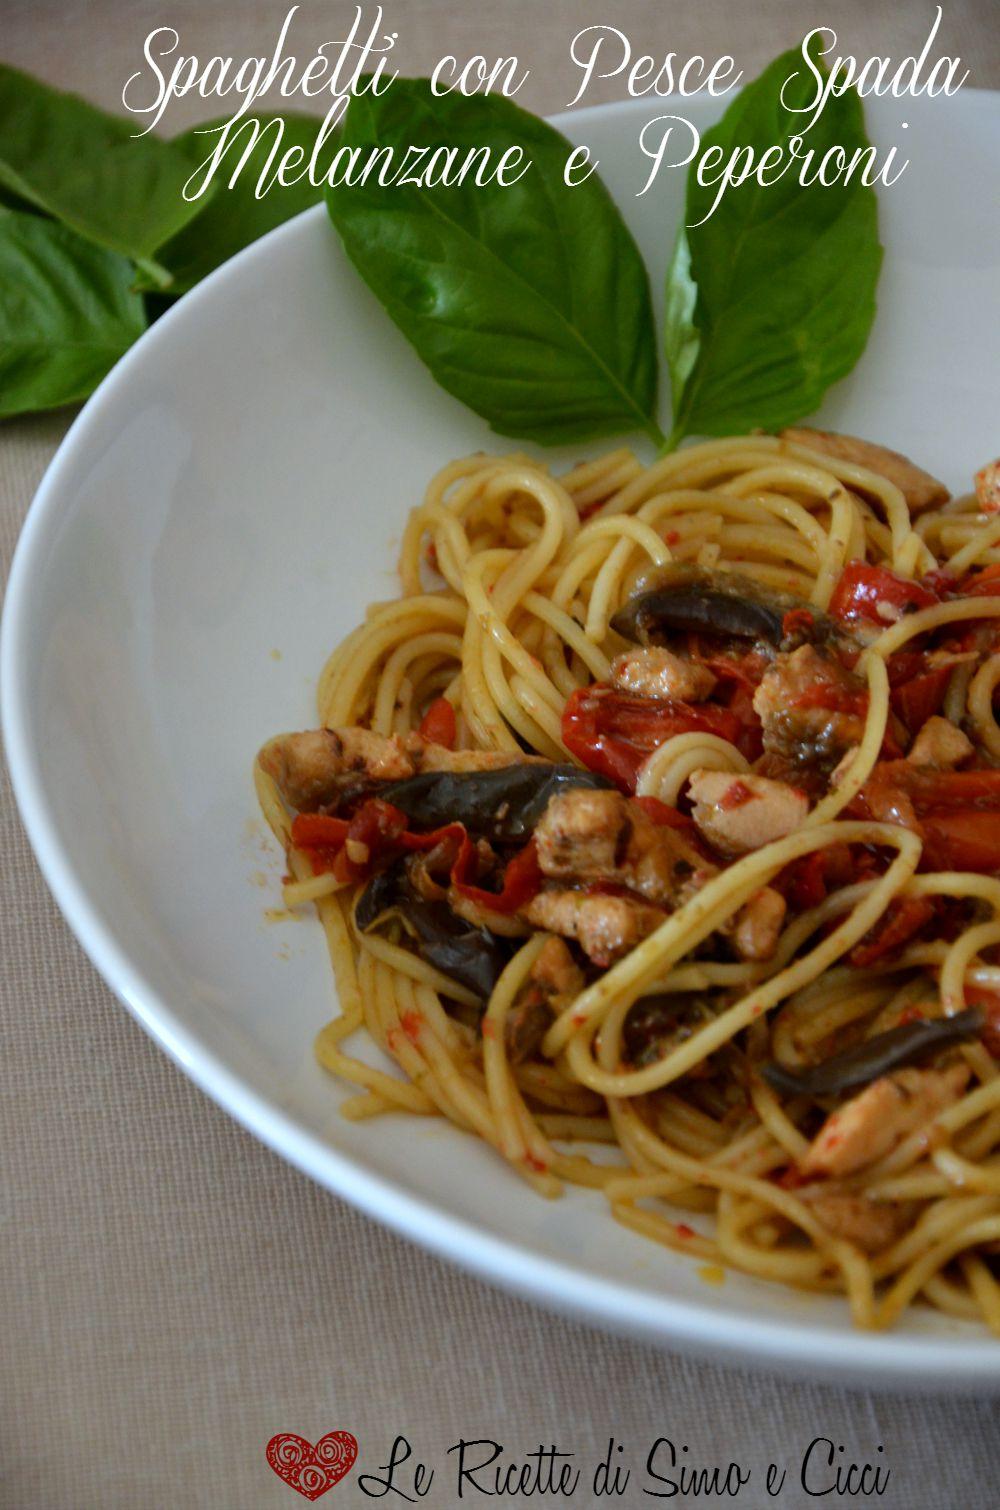 Spaghetti con Pesce Spada Melanzane e Peperoni